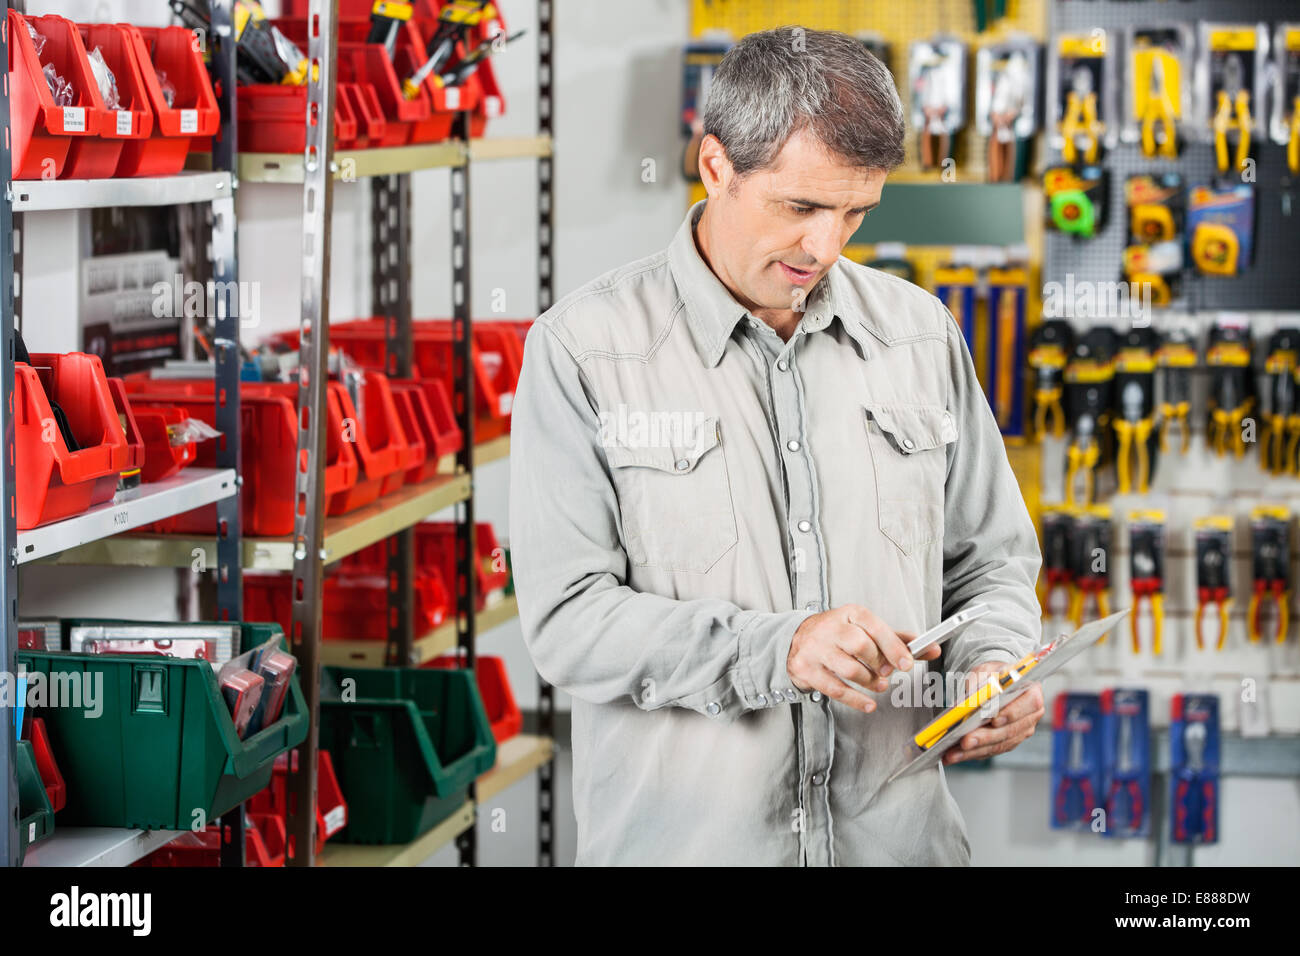 Customer Scanning Tool Packet Through Smartphone - Stock Image